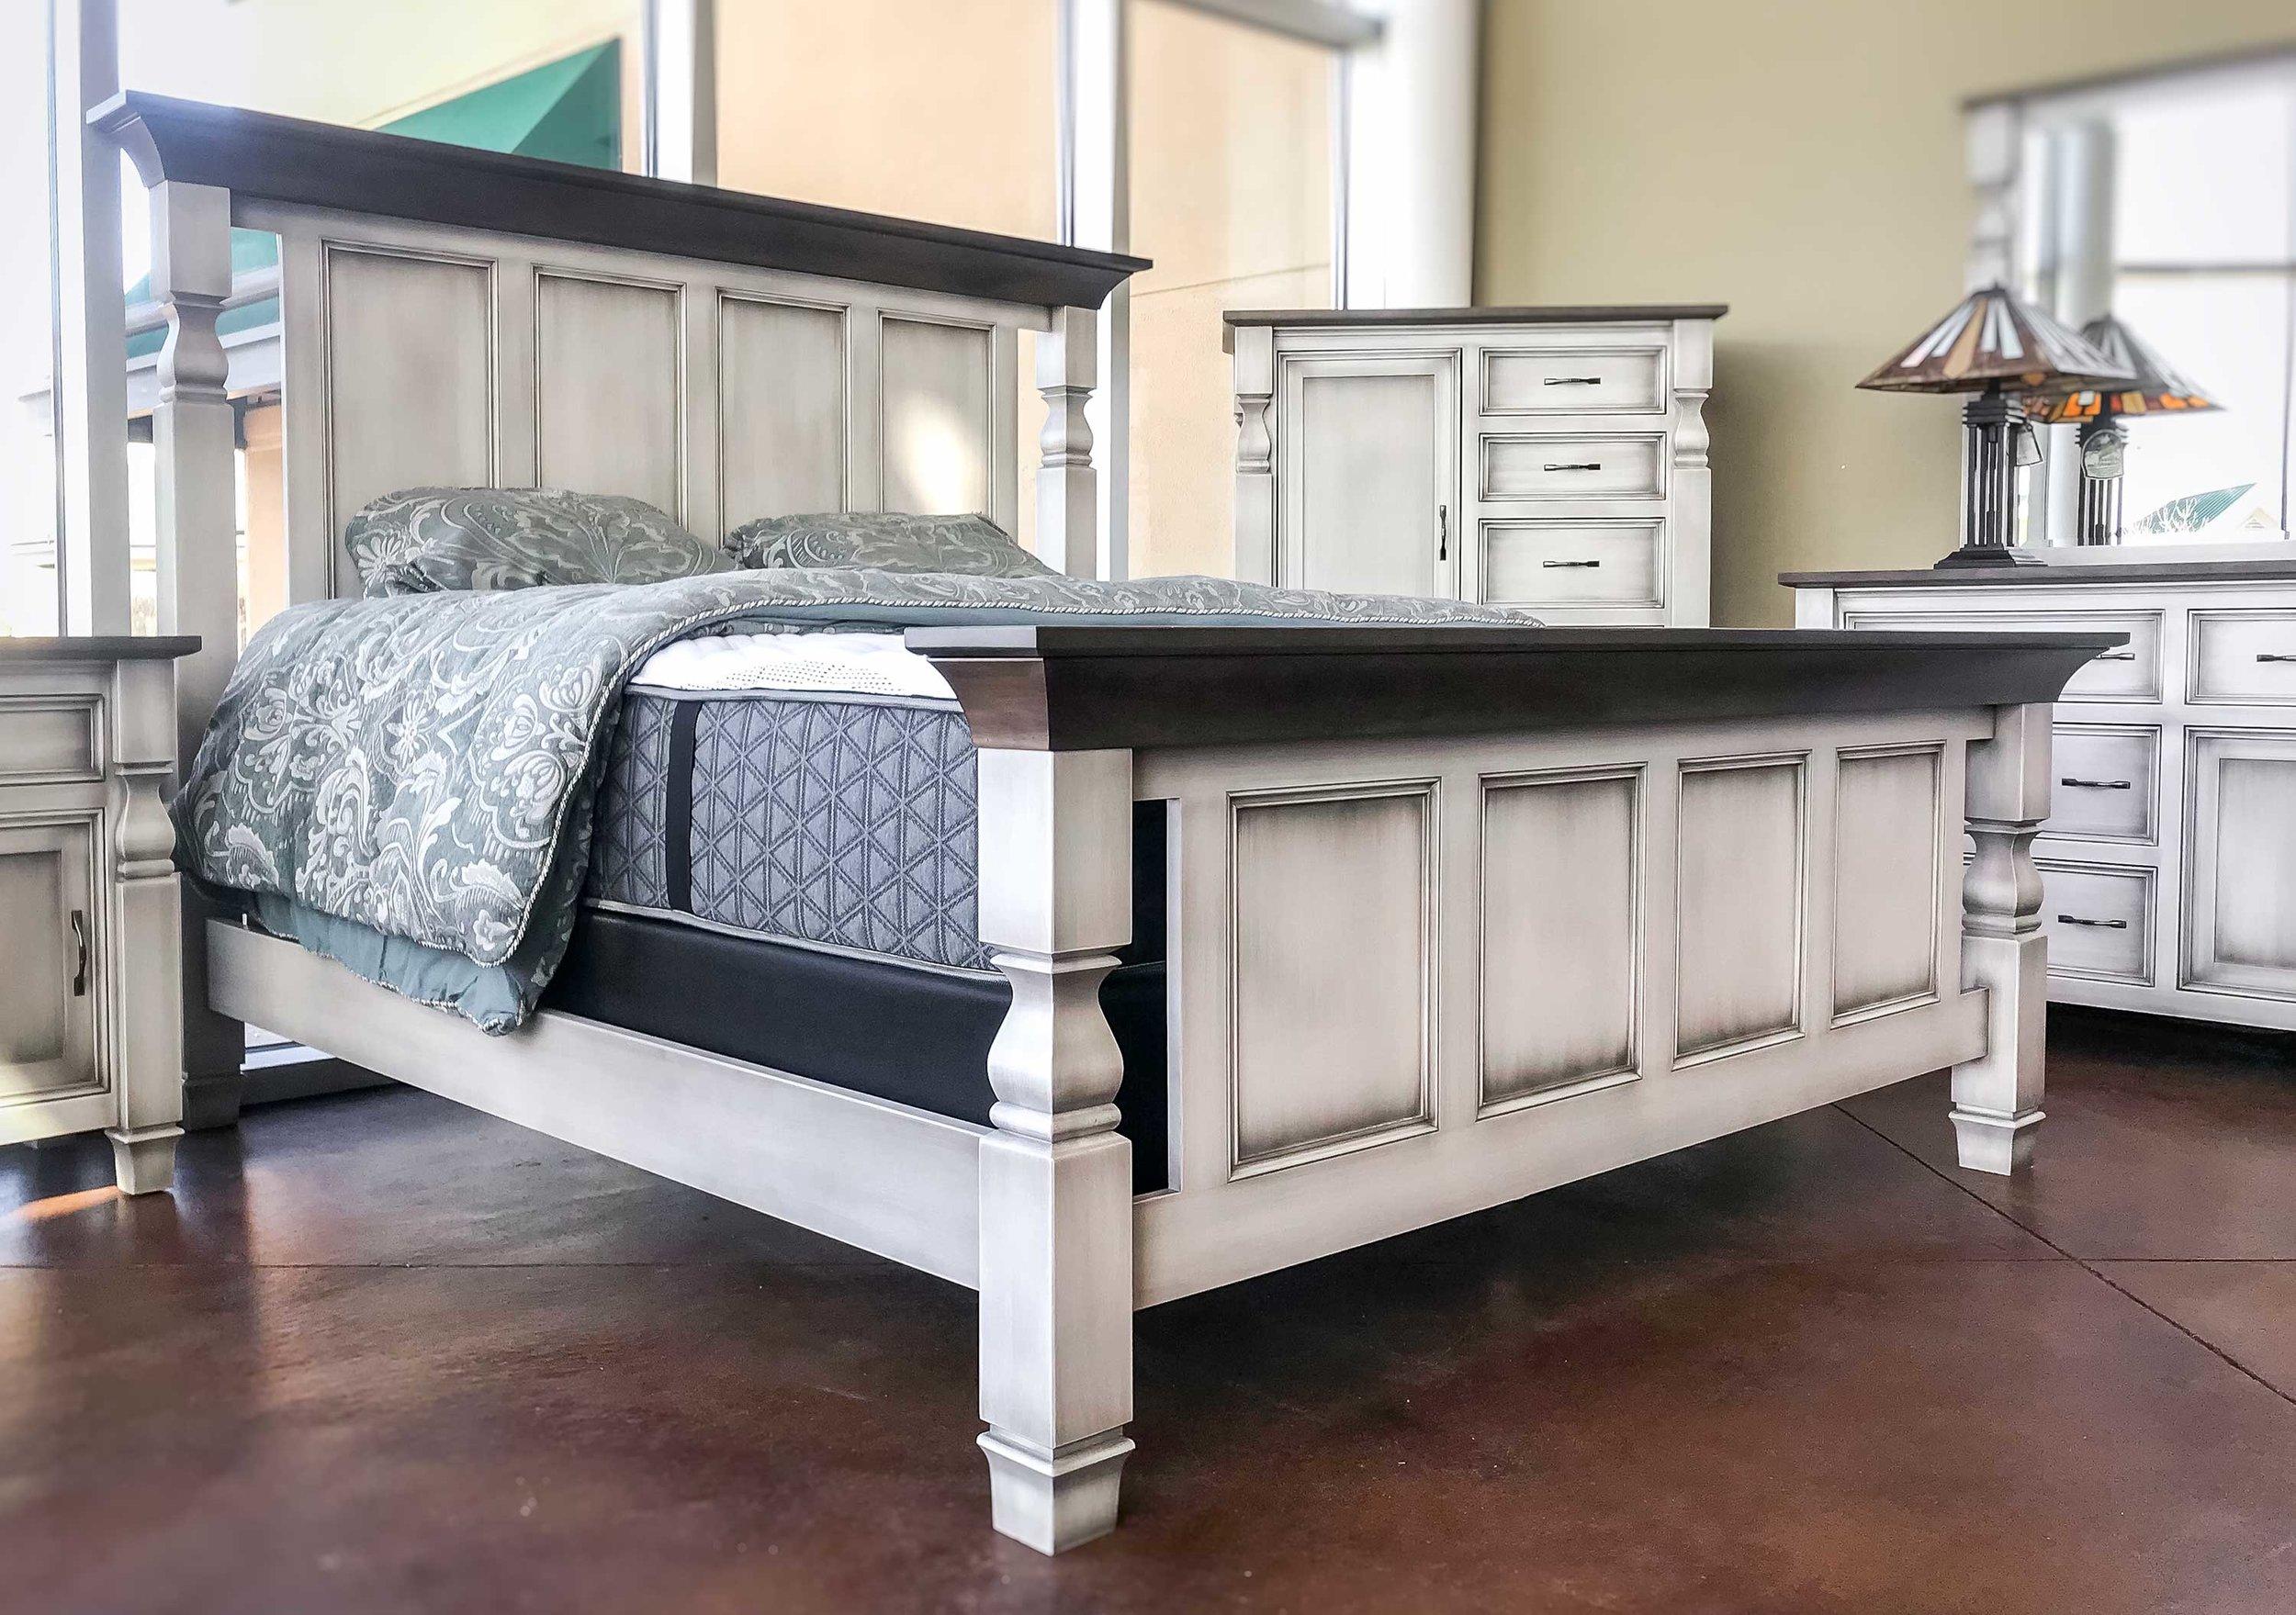 lancaster-bed.jpg